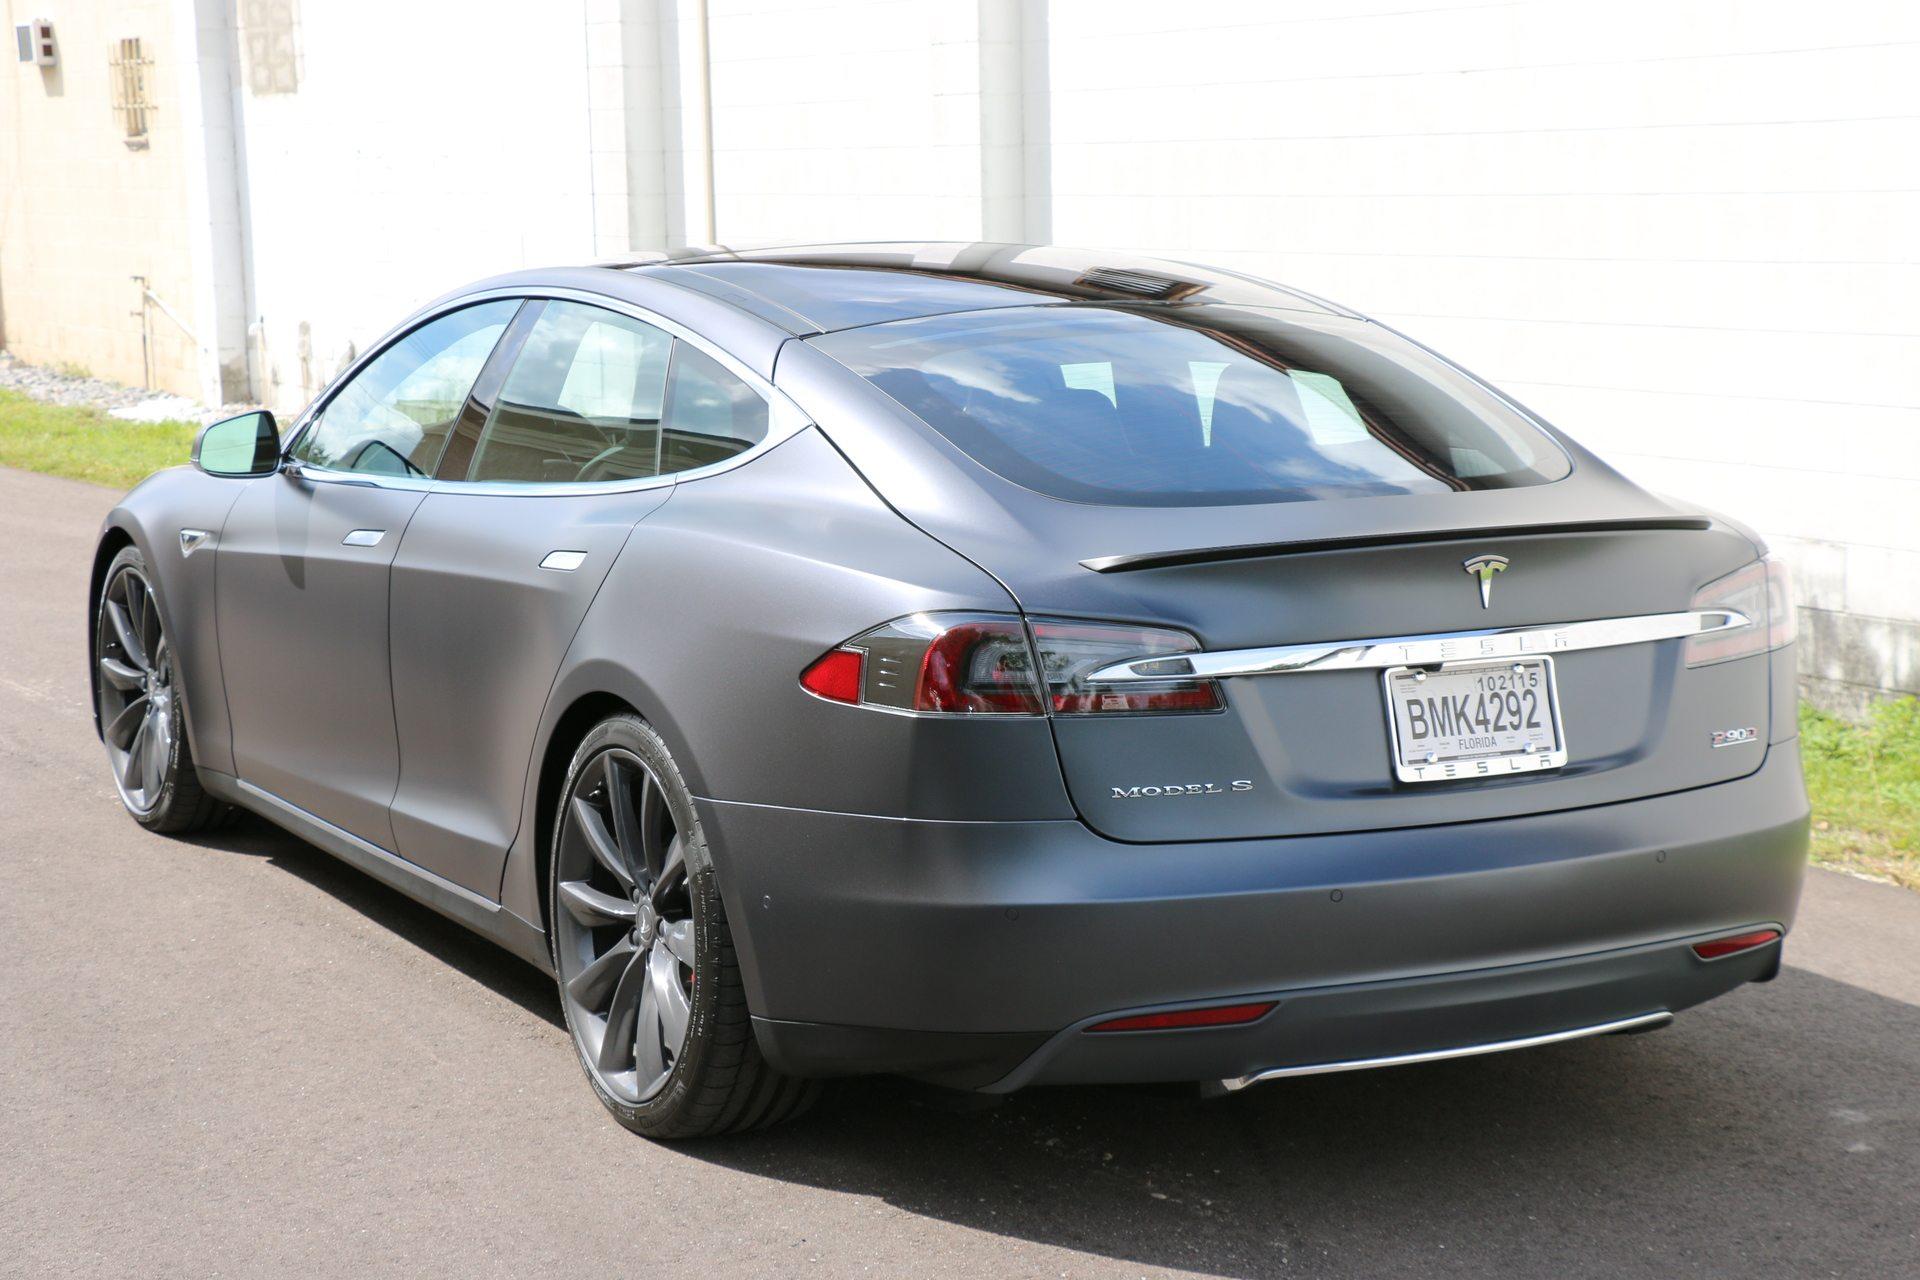 Auto Detailing Service - Paint Correction - Luxury Cars - Tampa Florida - Auto Paint Guard - Rear Mirror - Detailed Photo - Tesla Model S